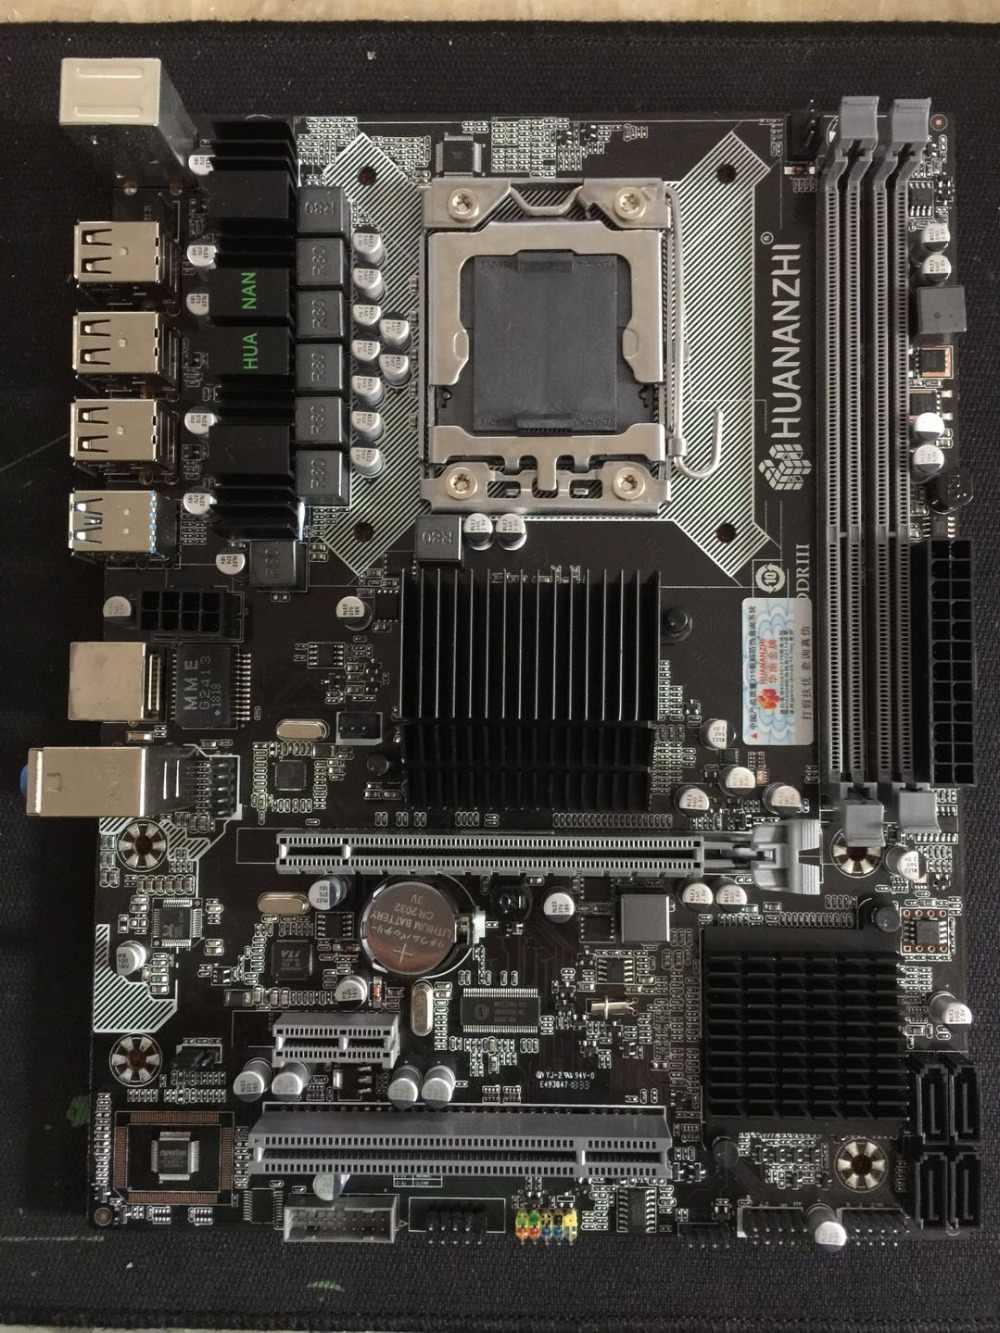 HUANANZHI X58 LGA1366 материнская плата в комплекте с процессором Intel Xeon X5570 2,93 ГГц ОЗУ 8 г (2*4 г) RECC GTX750Ti 2 г видеокарта